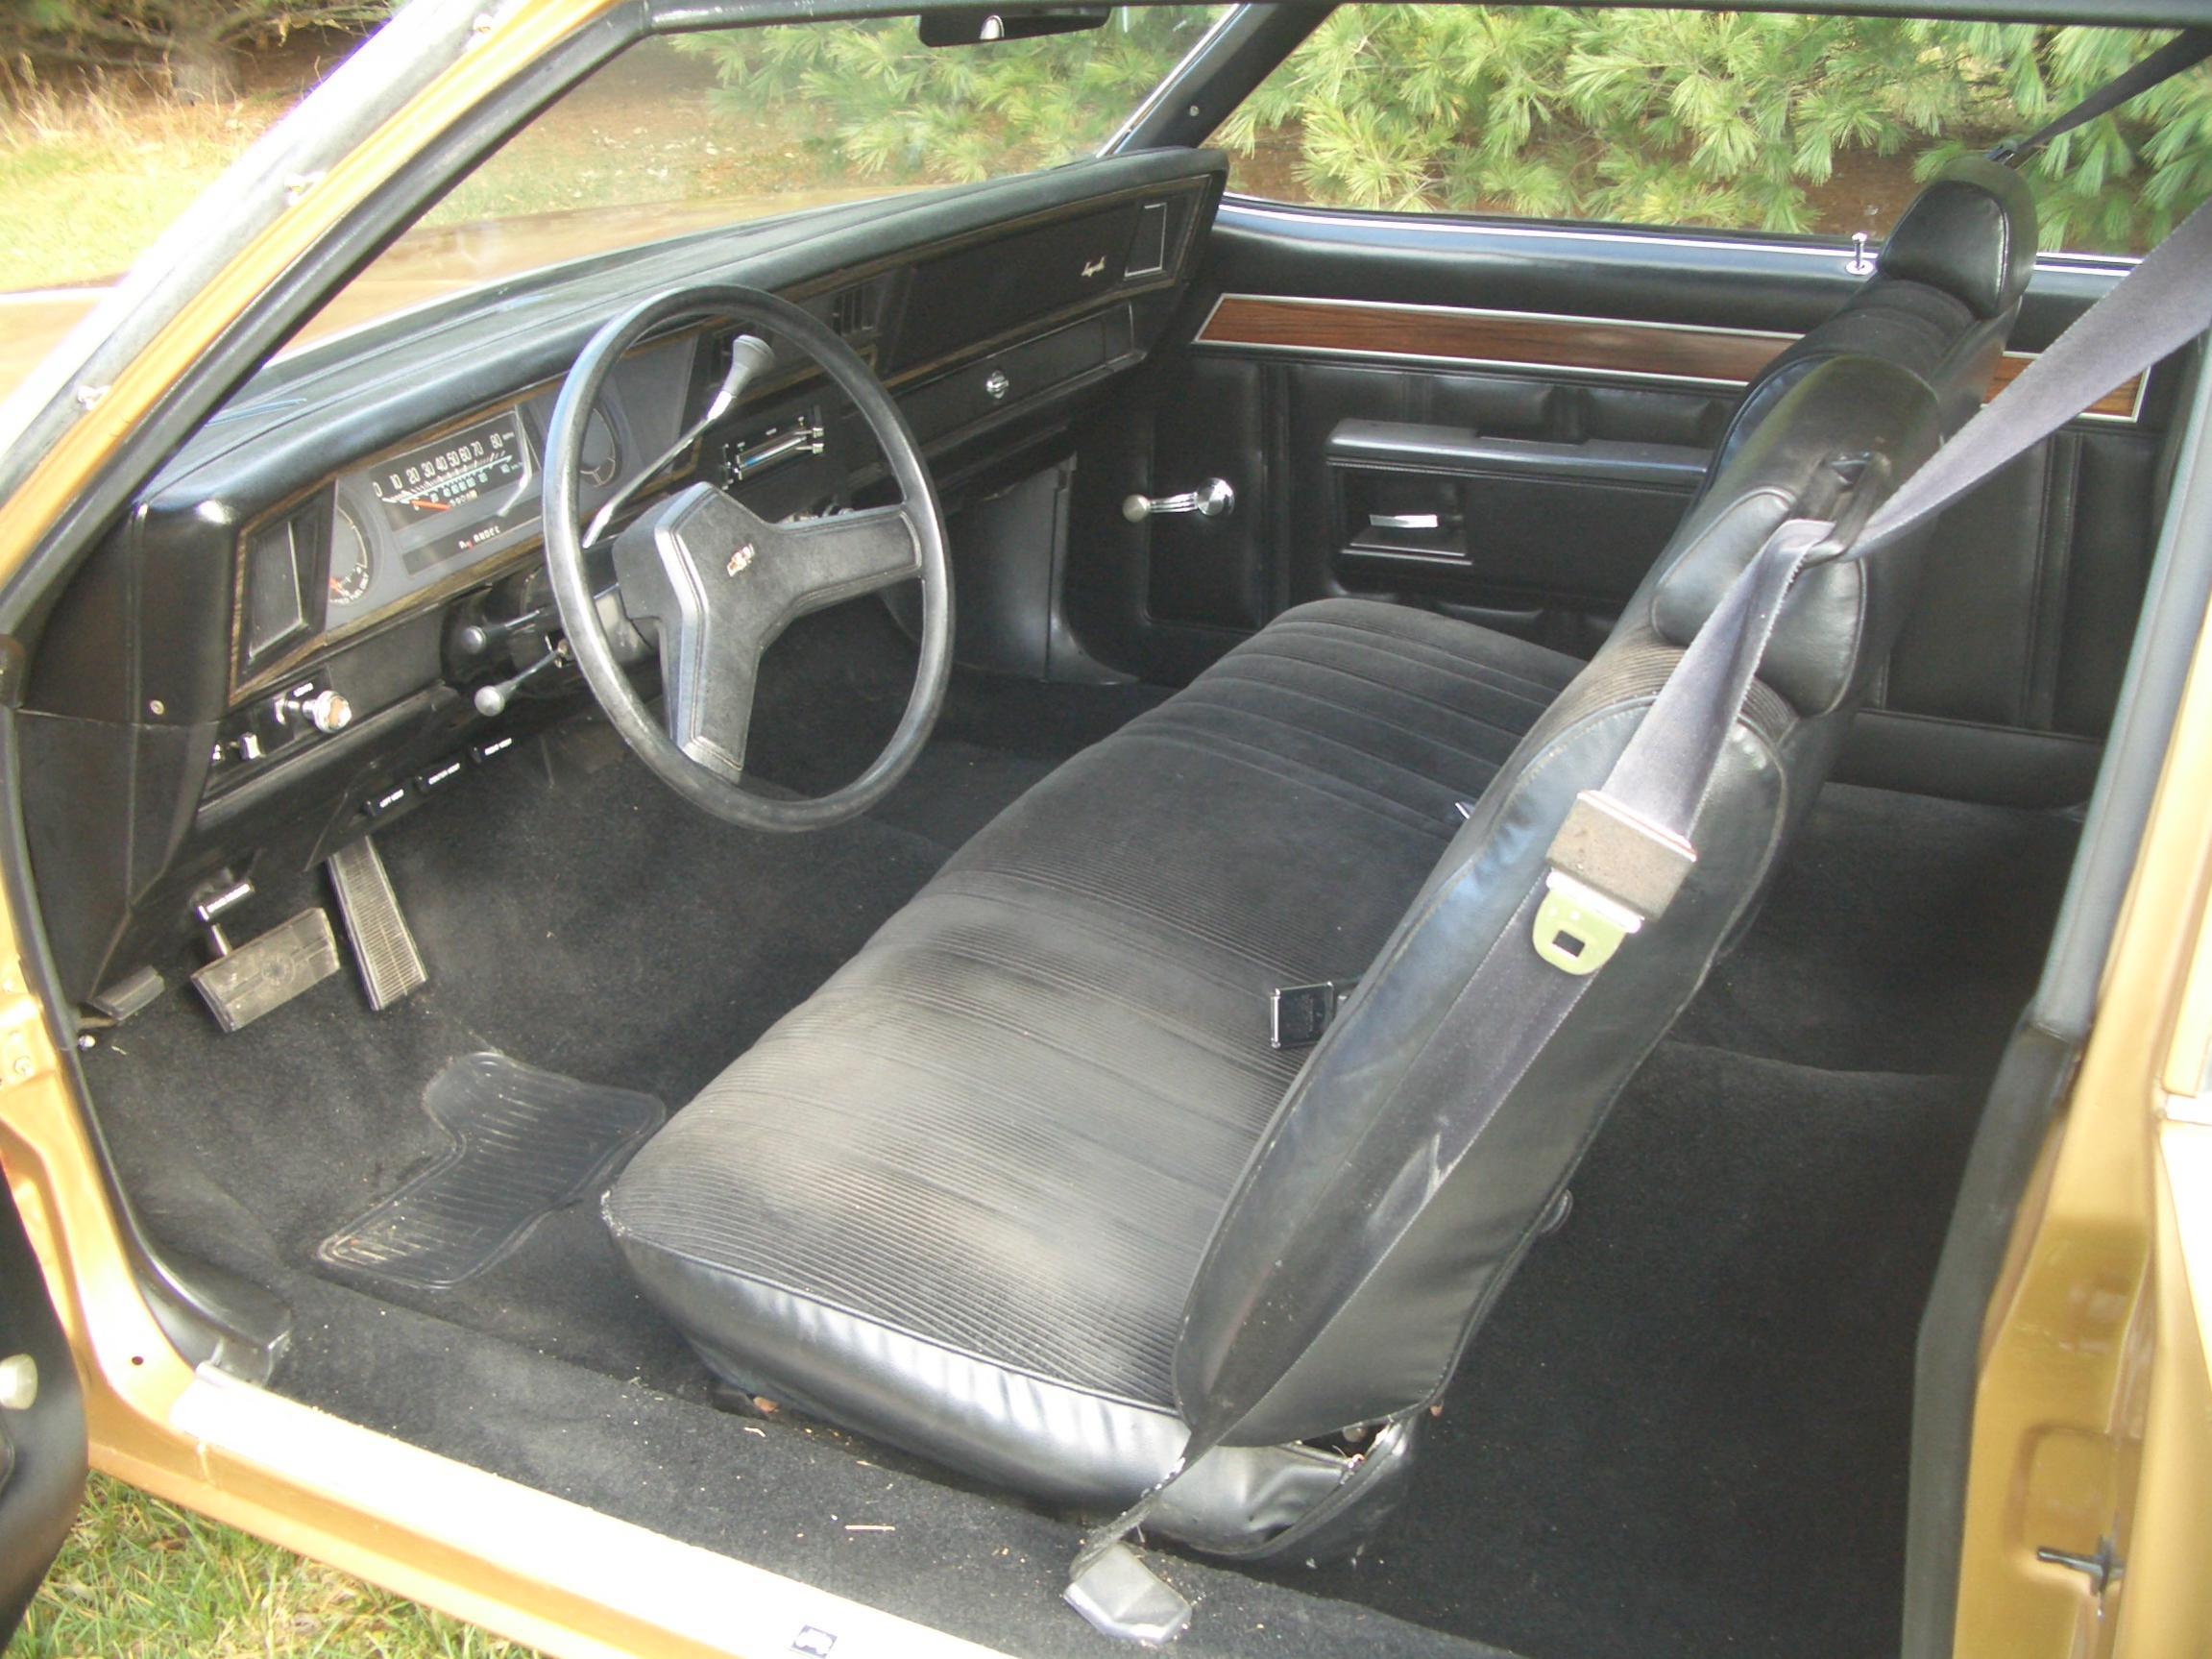 1977 Impala 2 door Black int, NON-AIR $6995 - Chevy Impala Forums